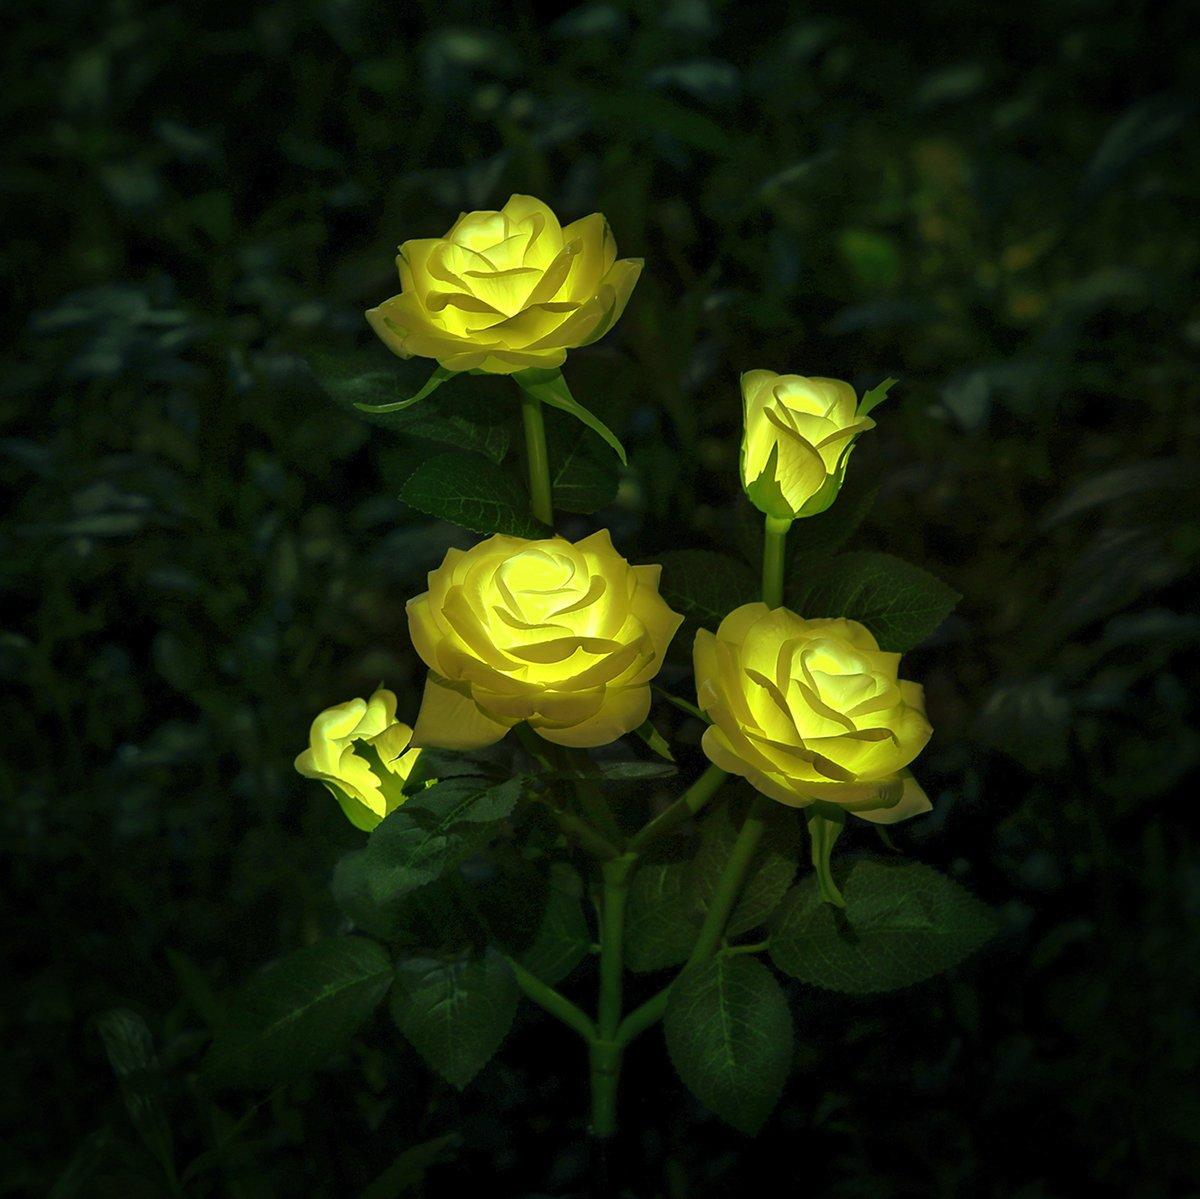 XLUX decorative solar rose flower light, Yellow